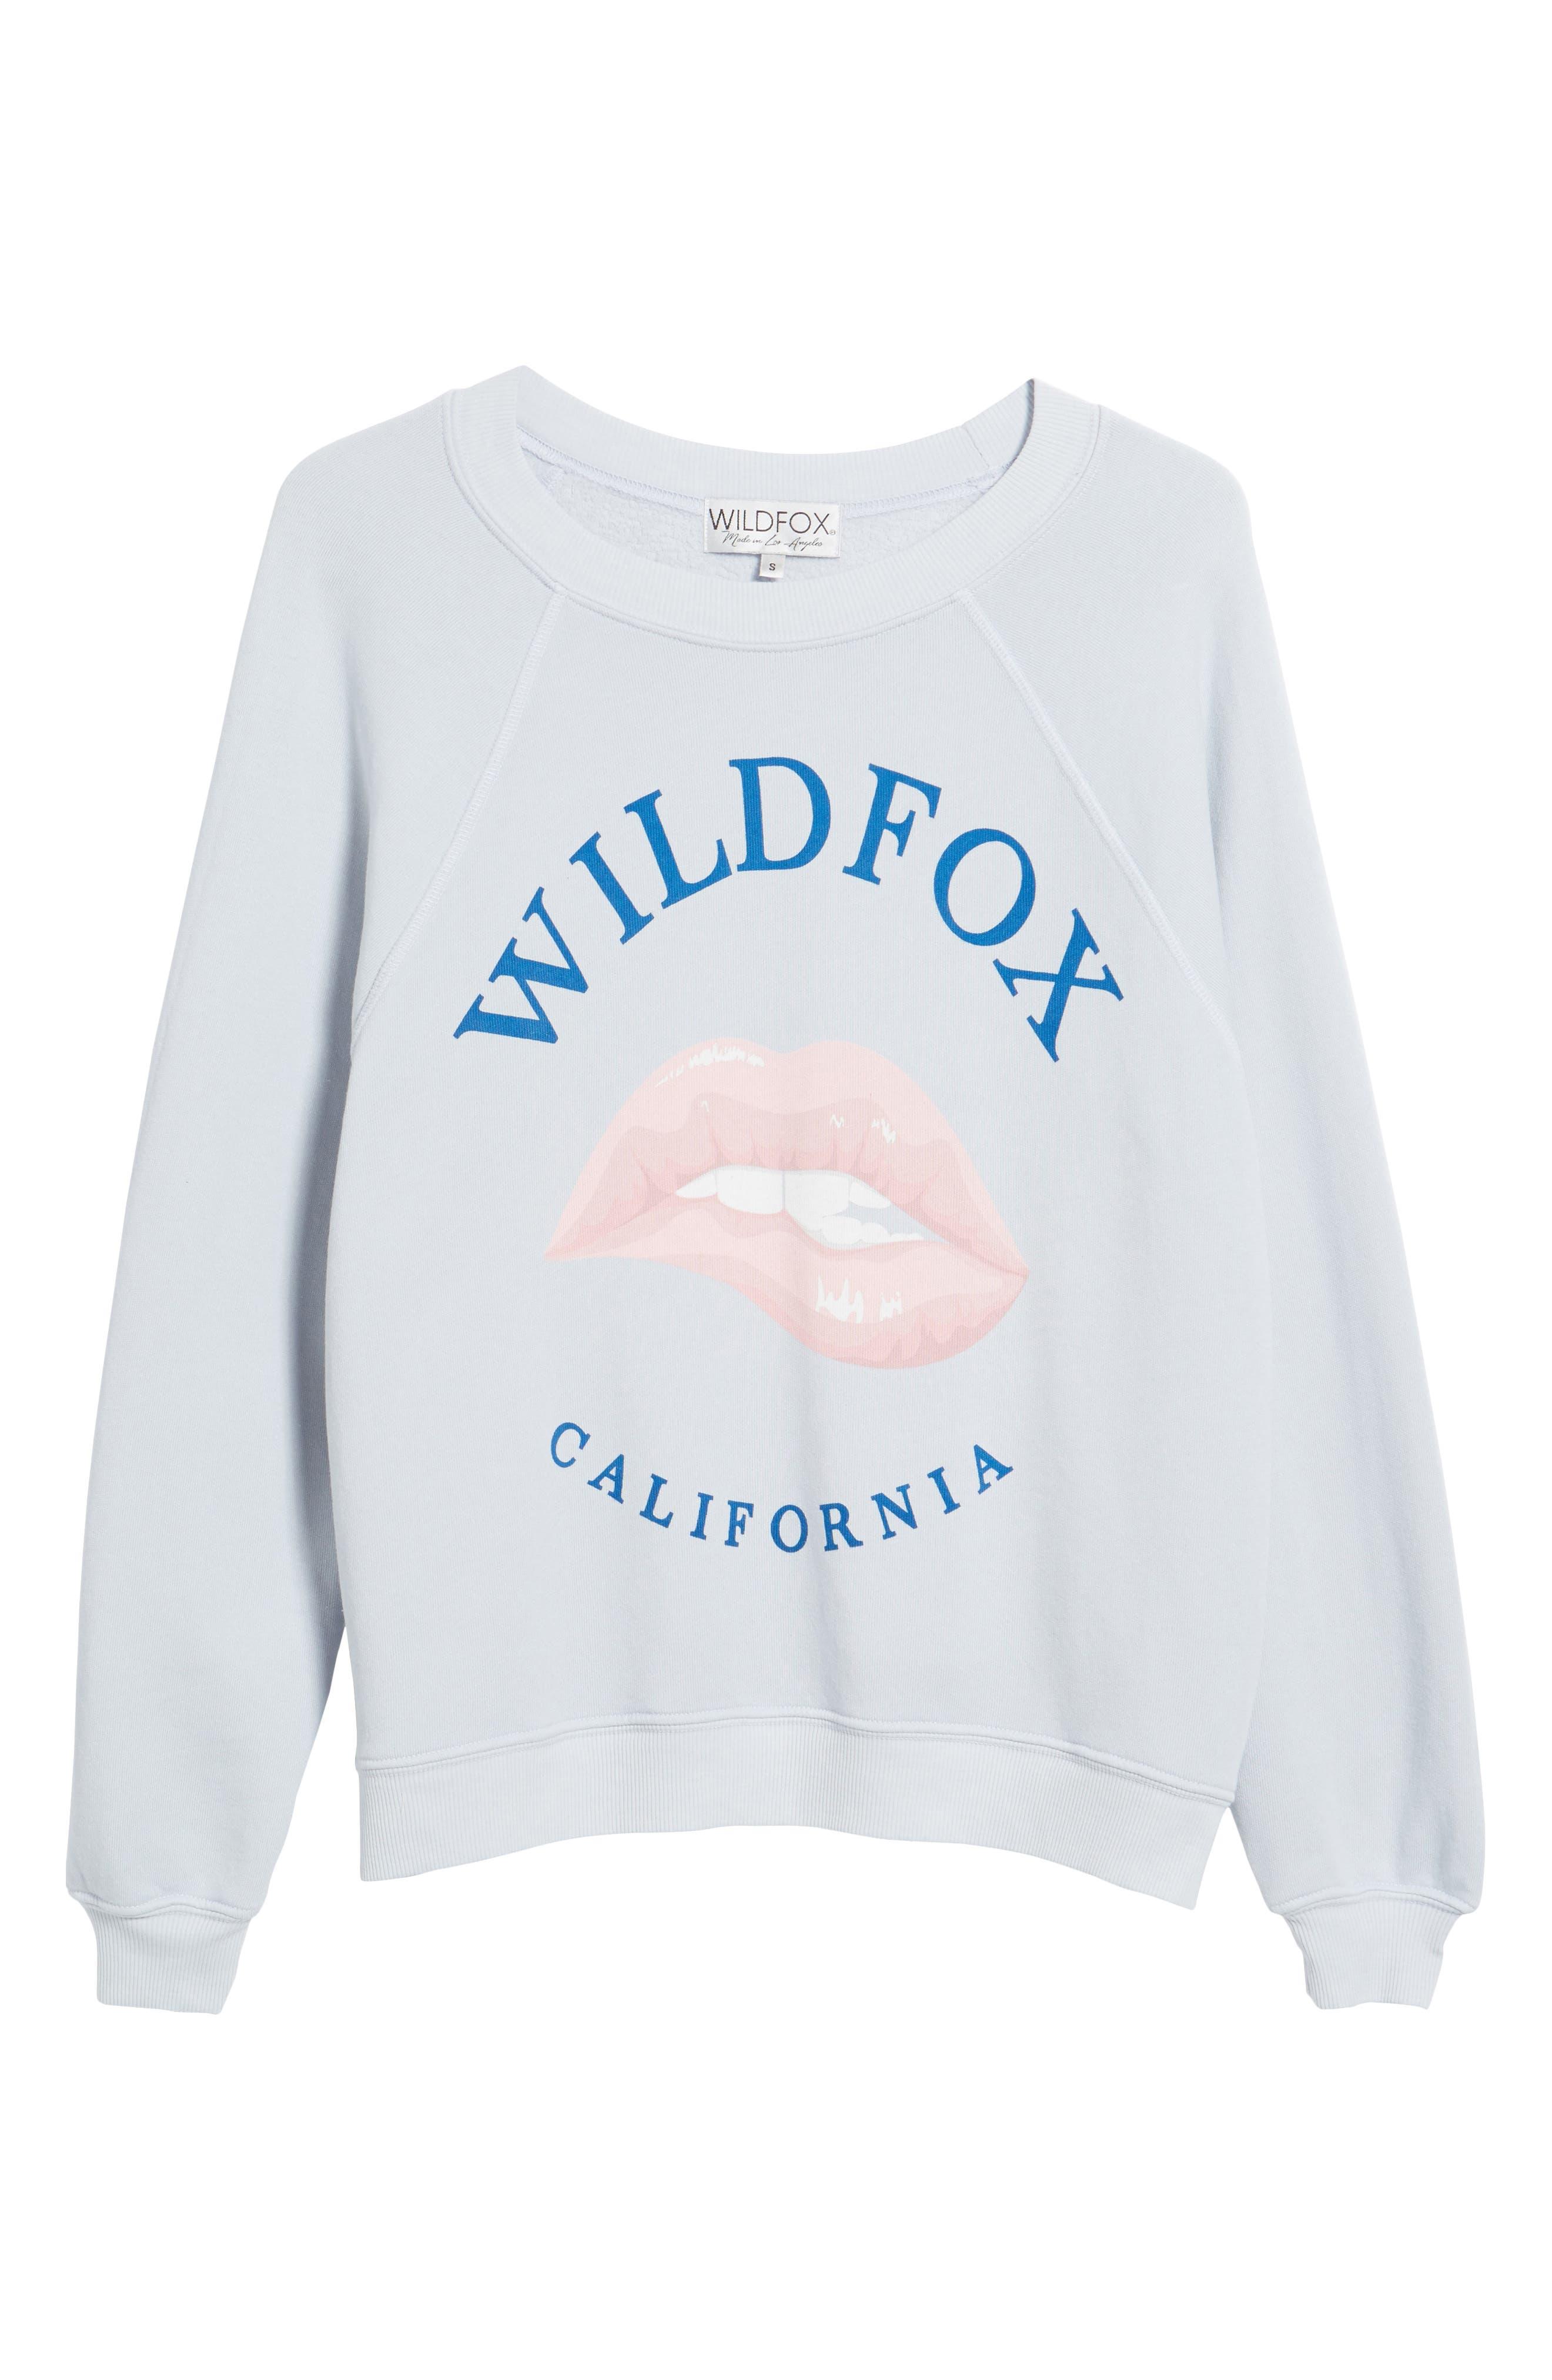 California Sommers Sweatshirt,                             Alternate thumbnail 6, color,                             Blue Ribbon